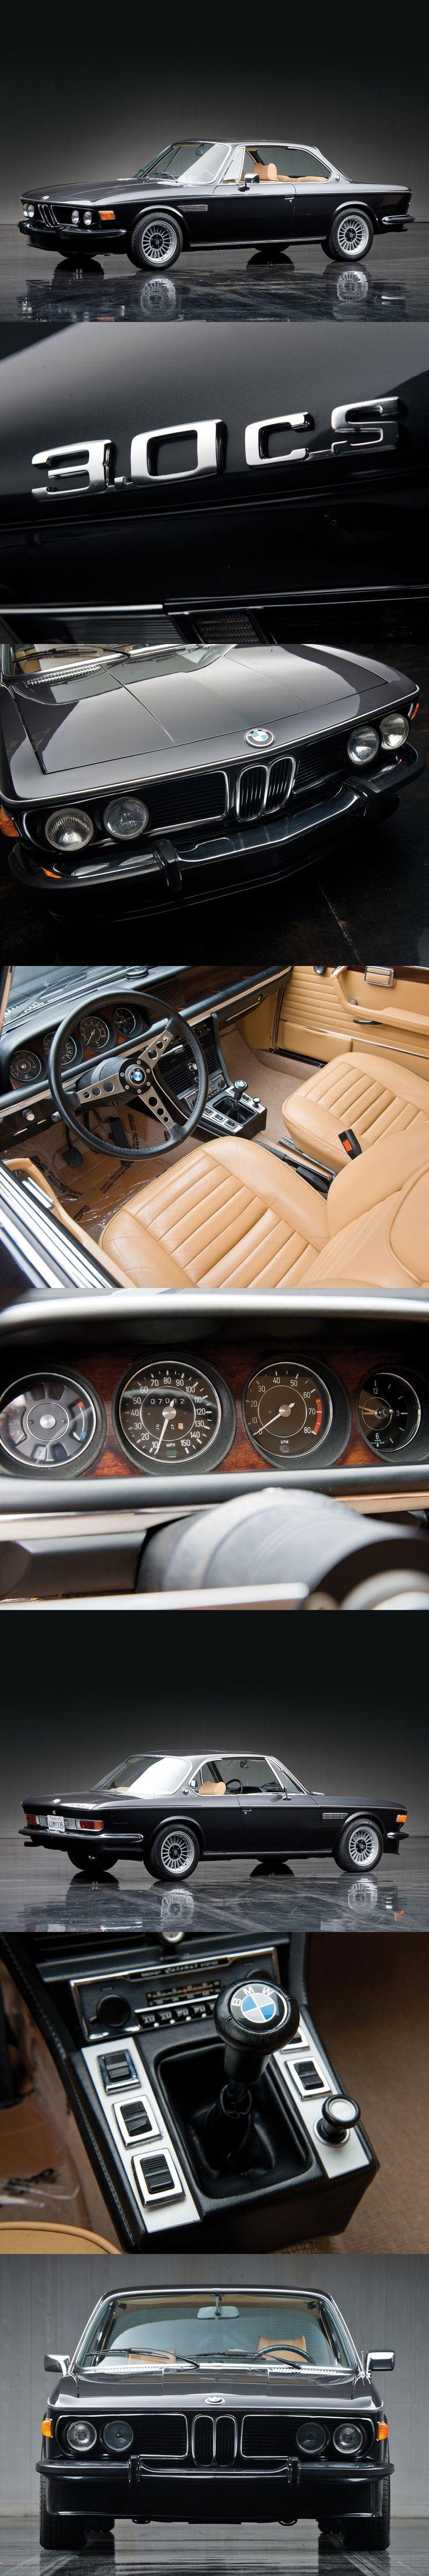 #BMW 3.0 CS #QuirkyRides #ClassicCar Classic Bimmers